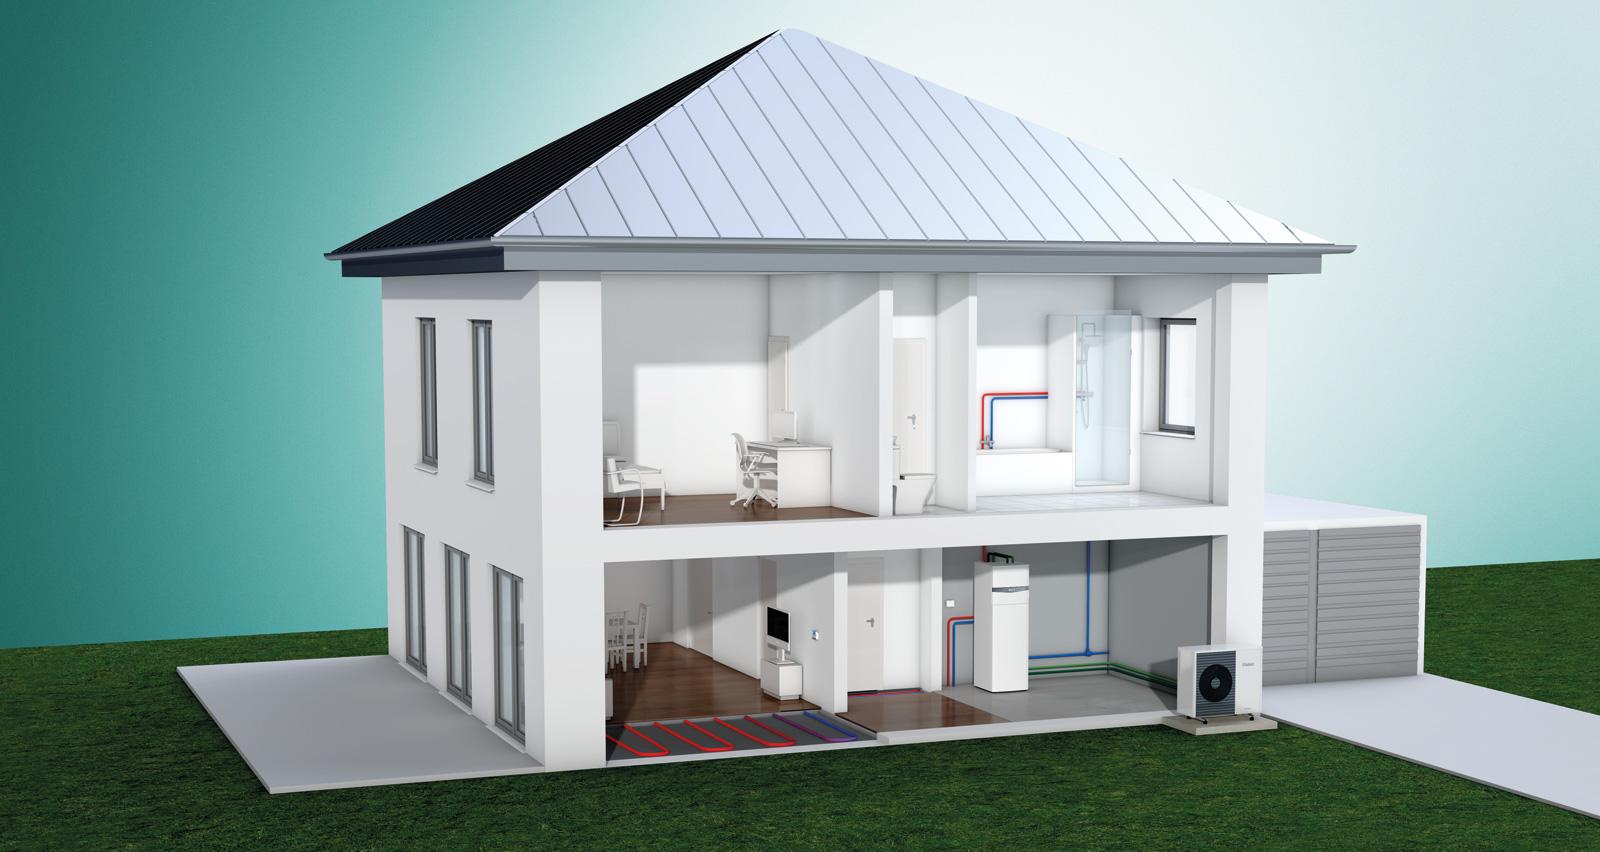 Tepelné čerpadlo aroTHERM Split vzduch/voda, modul uniTOWER, podlahové kúrenie a systémový regulátor multiMATIC.